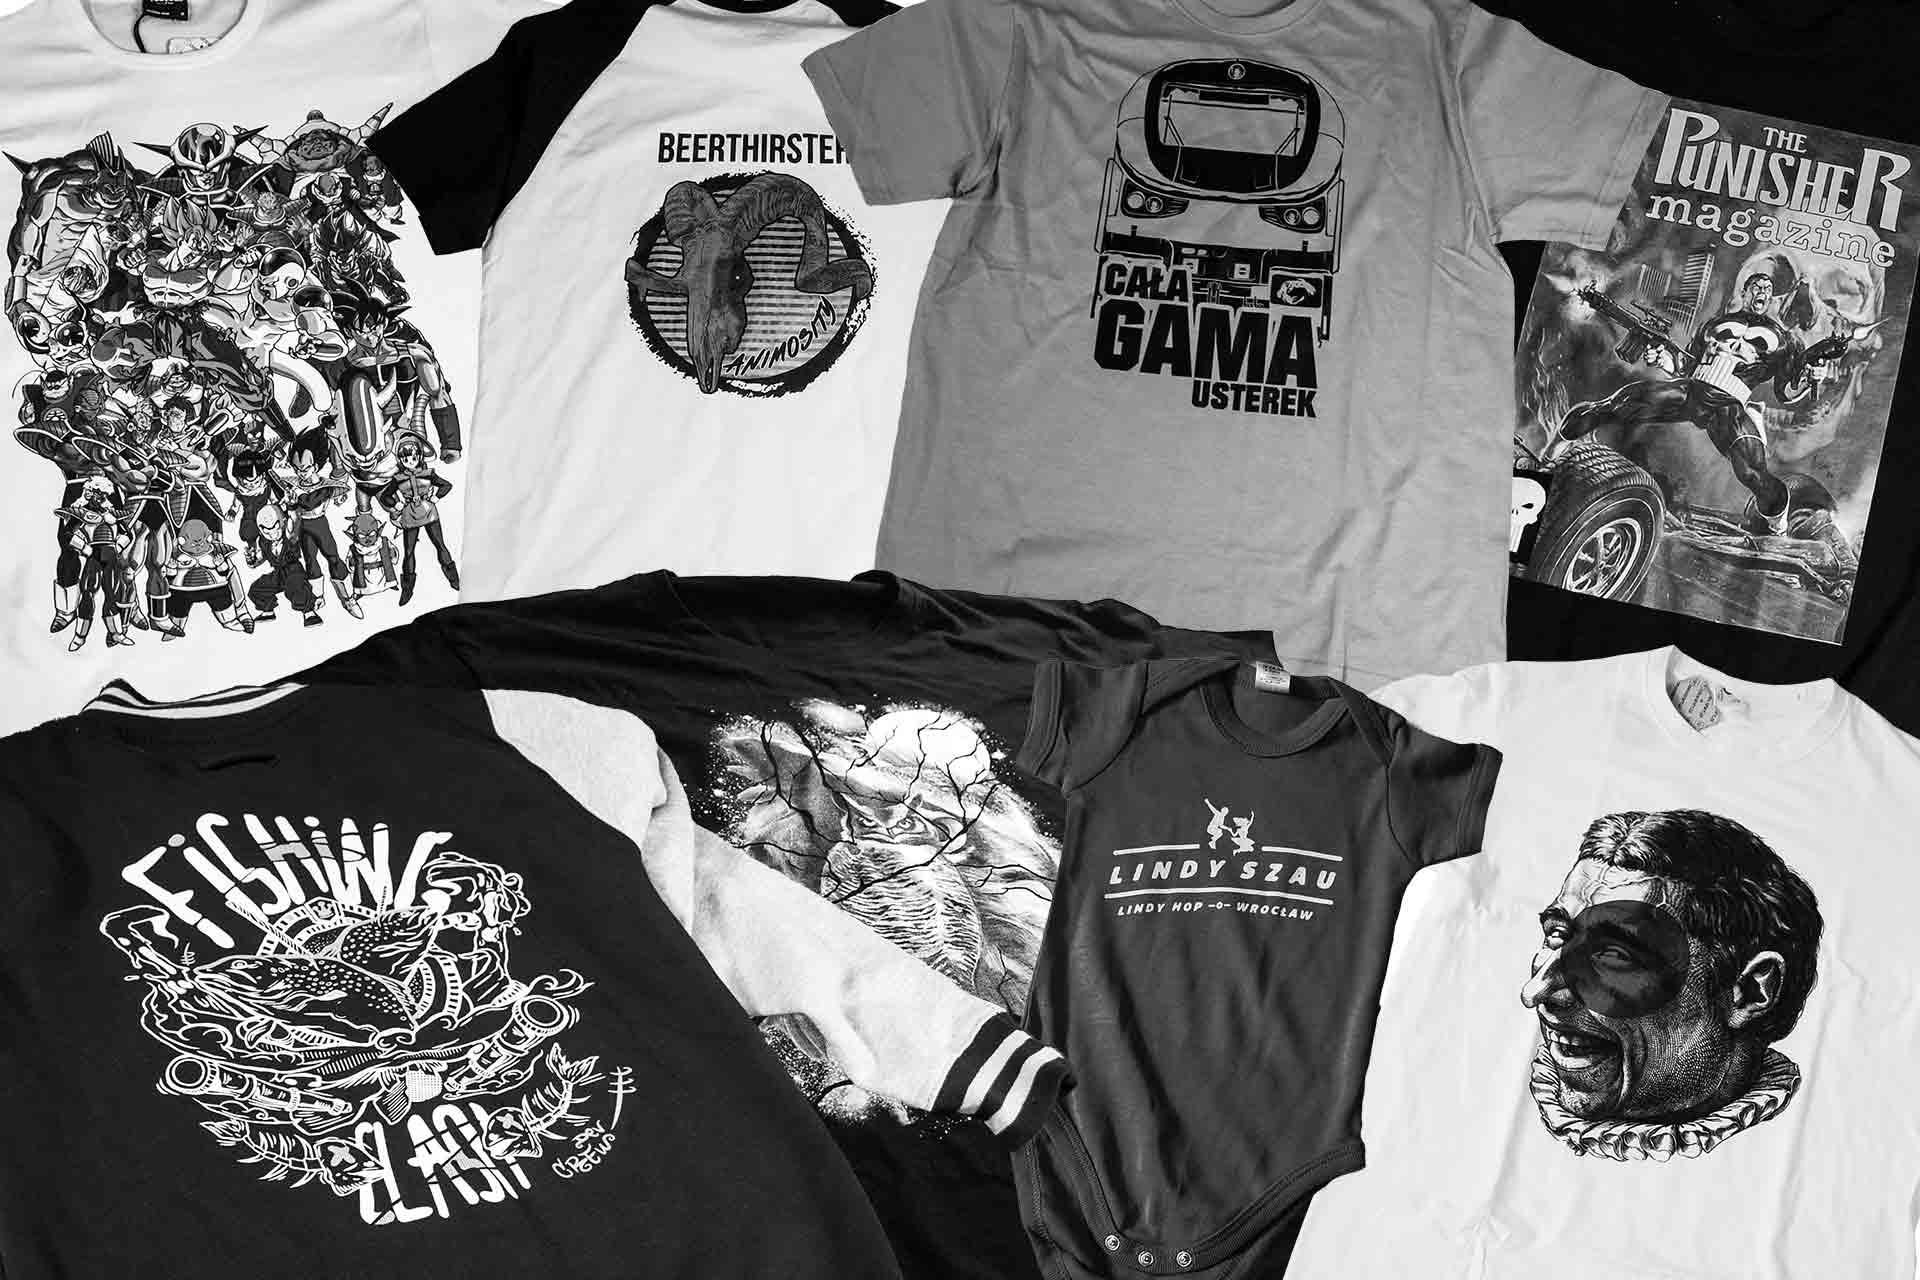 Koszulki z nadrukiem DTG kolaż